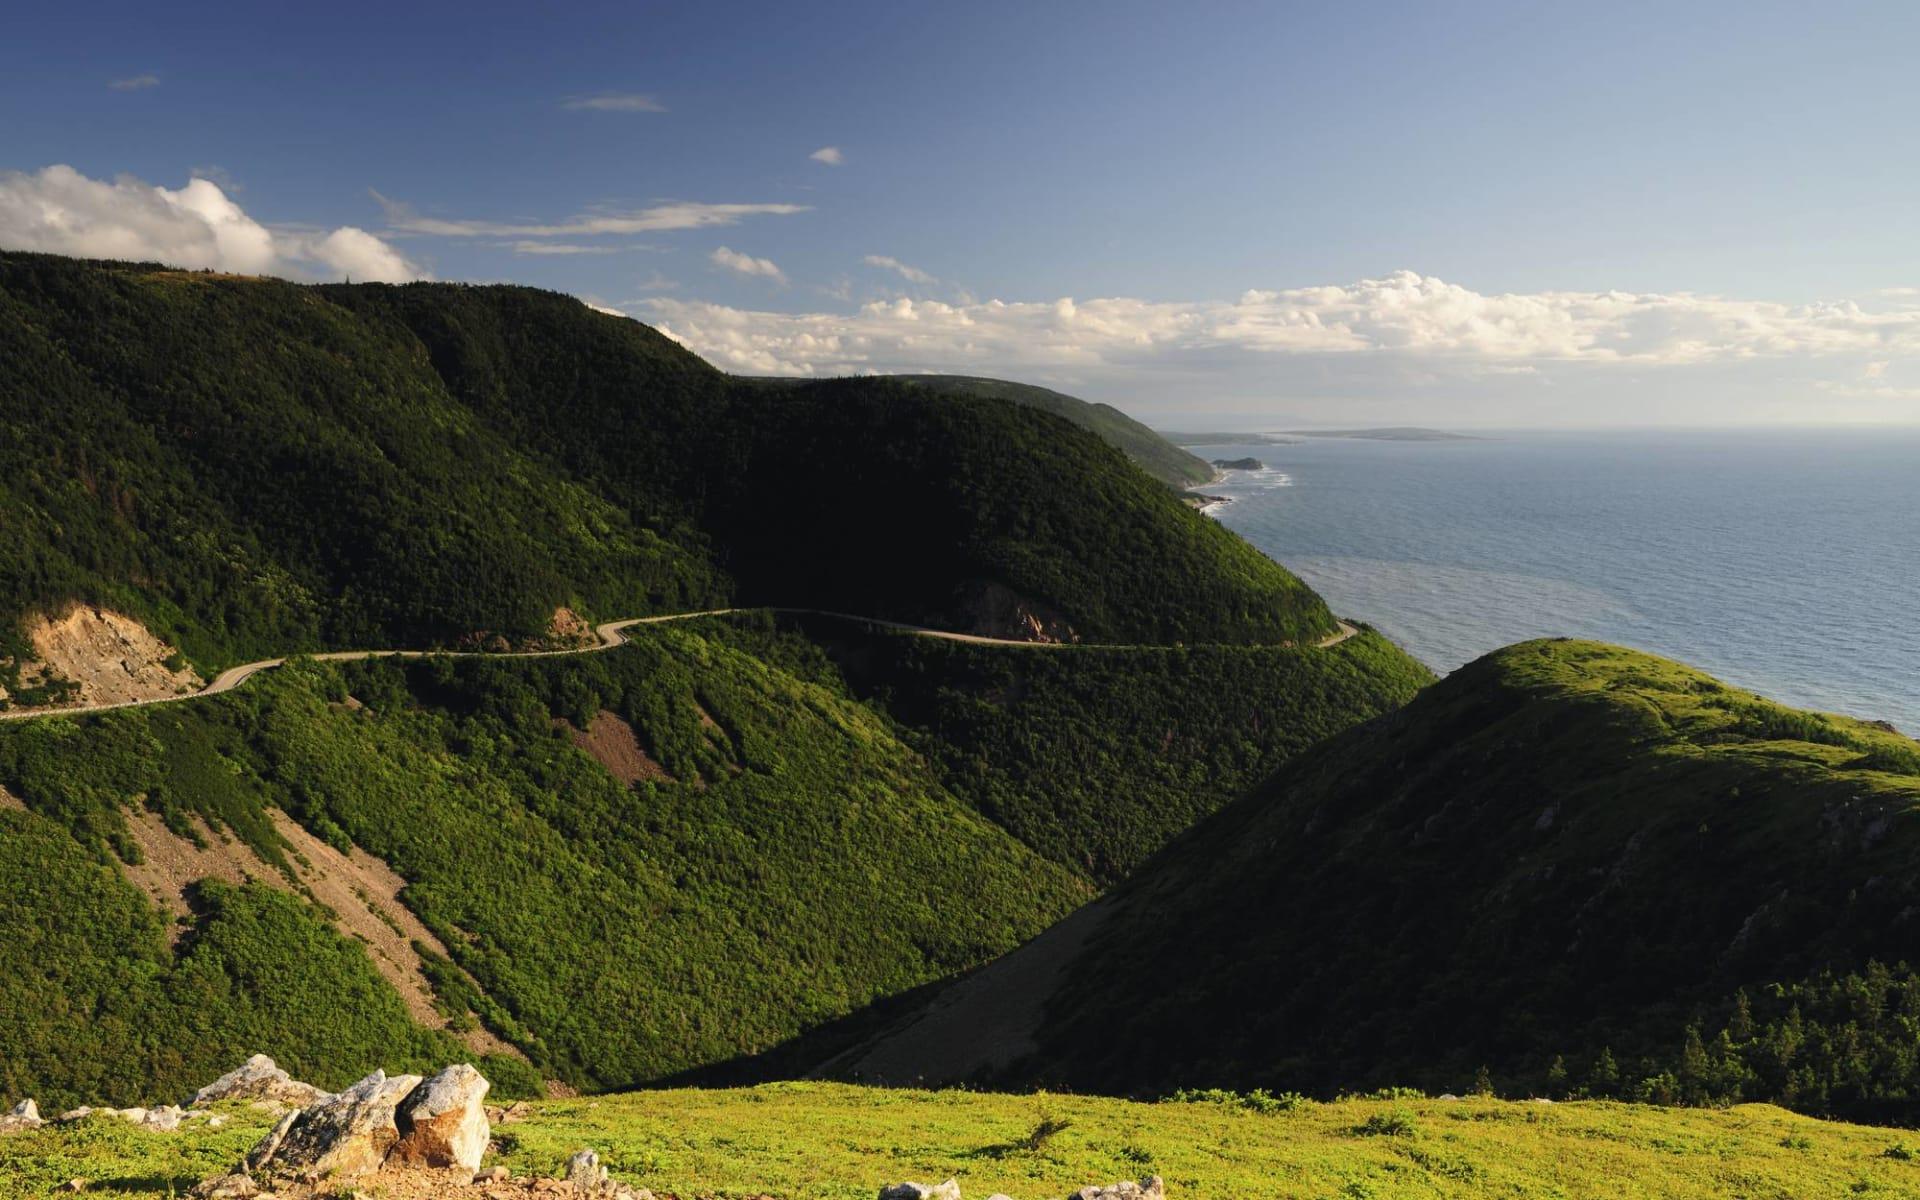 Spirit of the Atlantic ab Halifax: Atlantikkanada - Nova Scotia - Cape Breton Highlands National Park